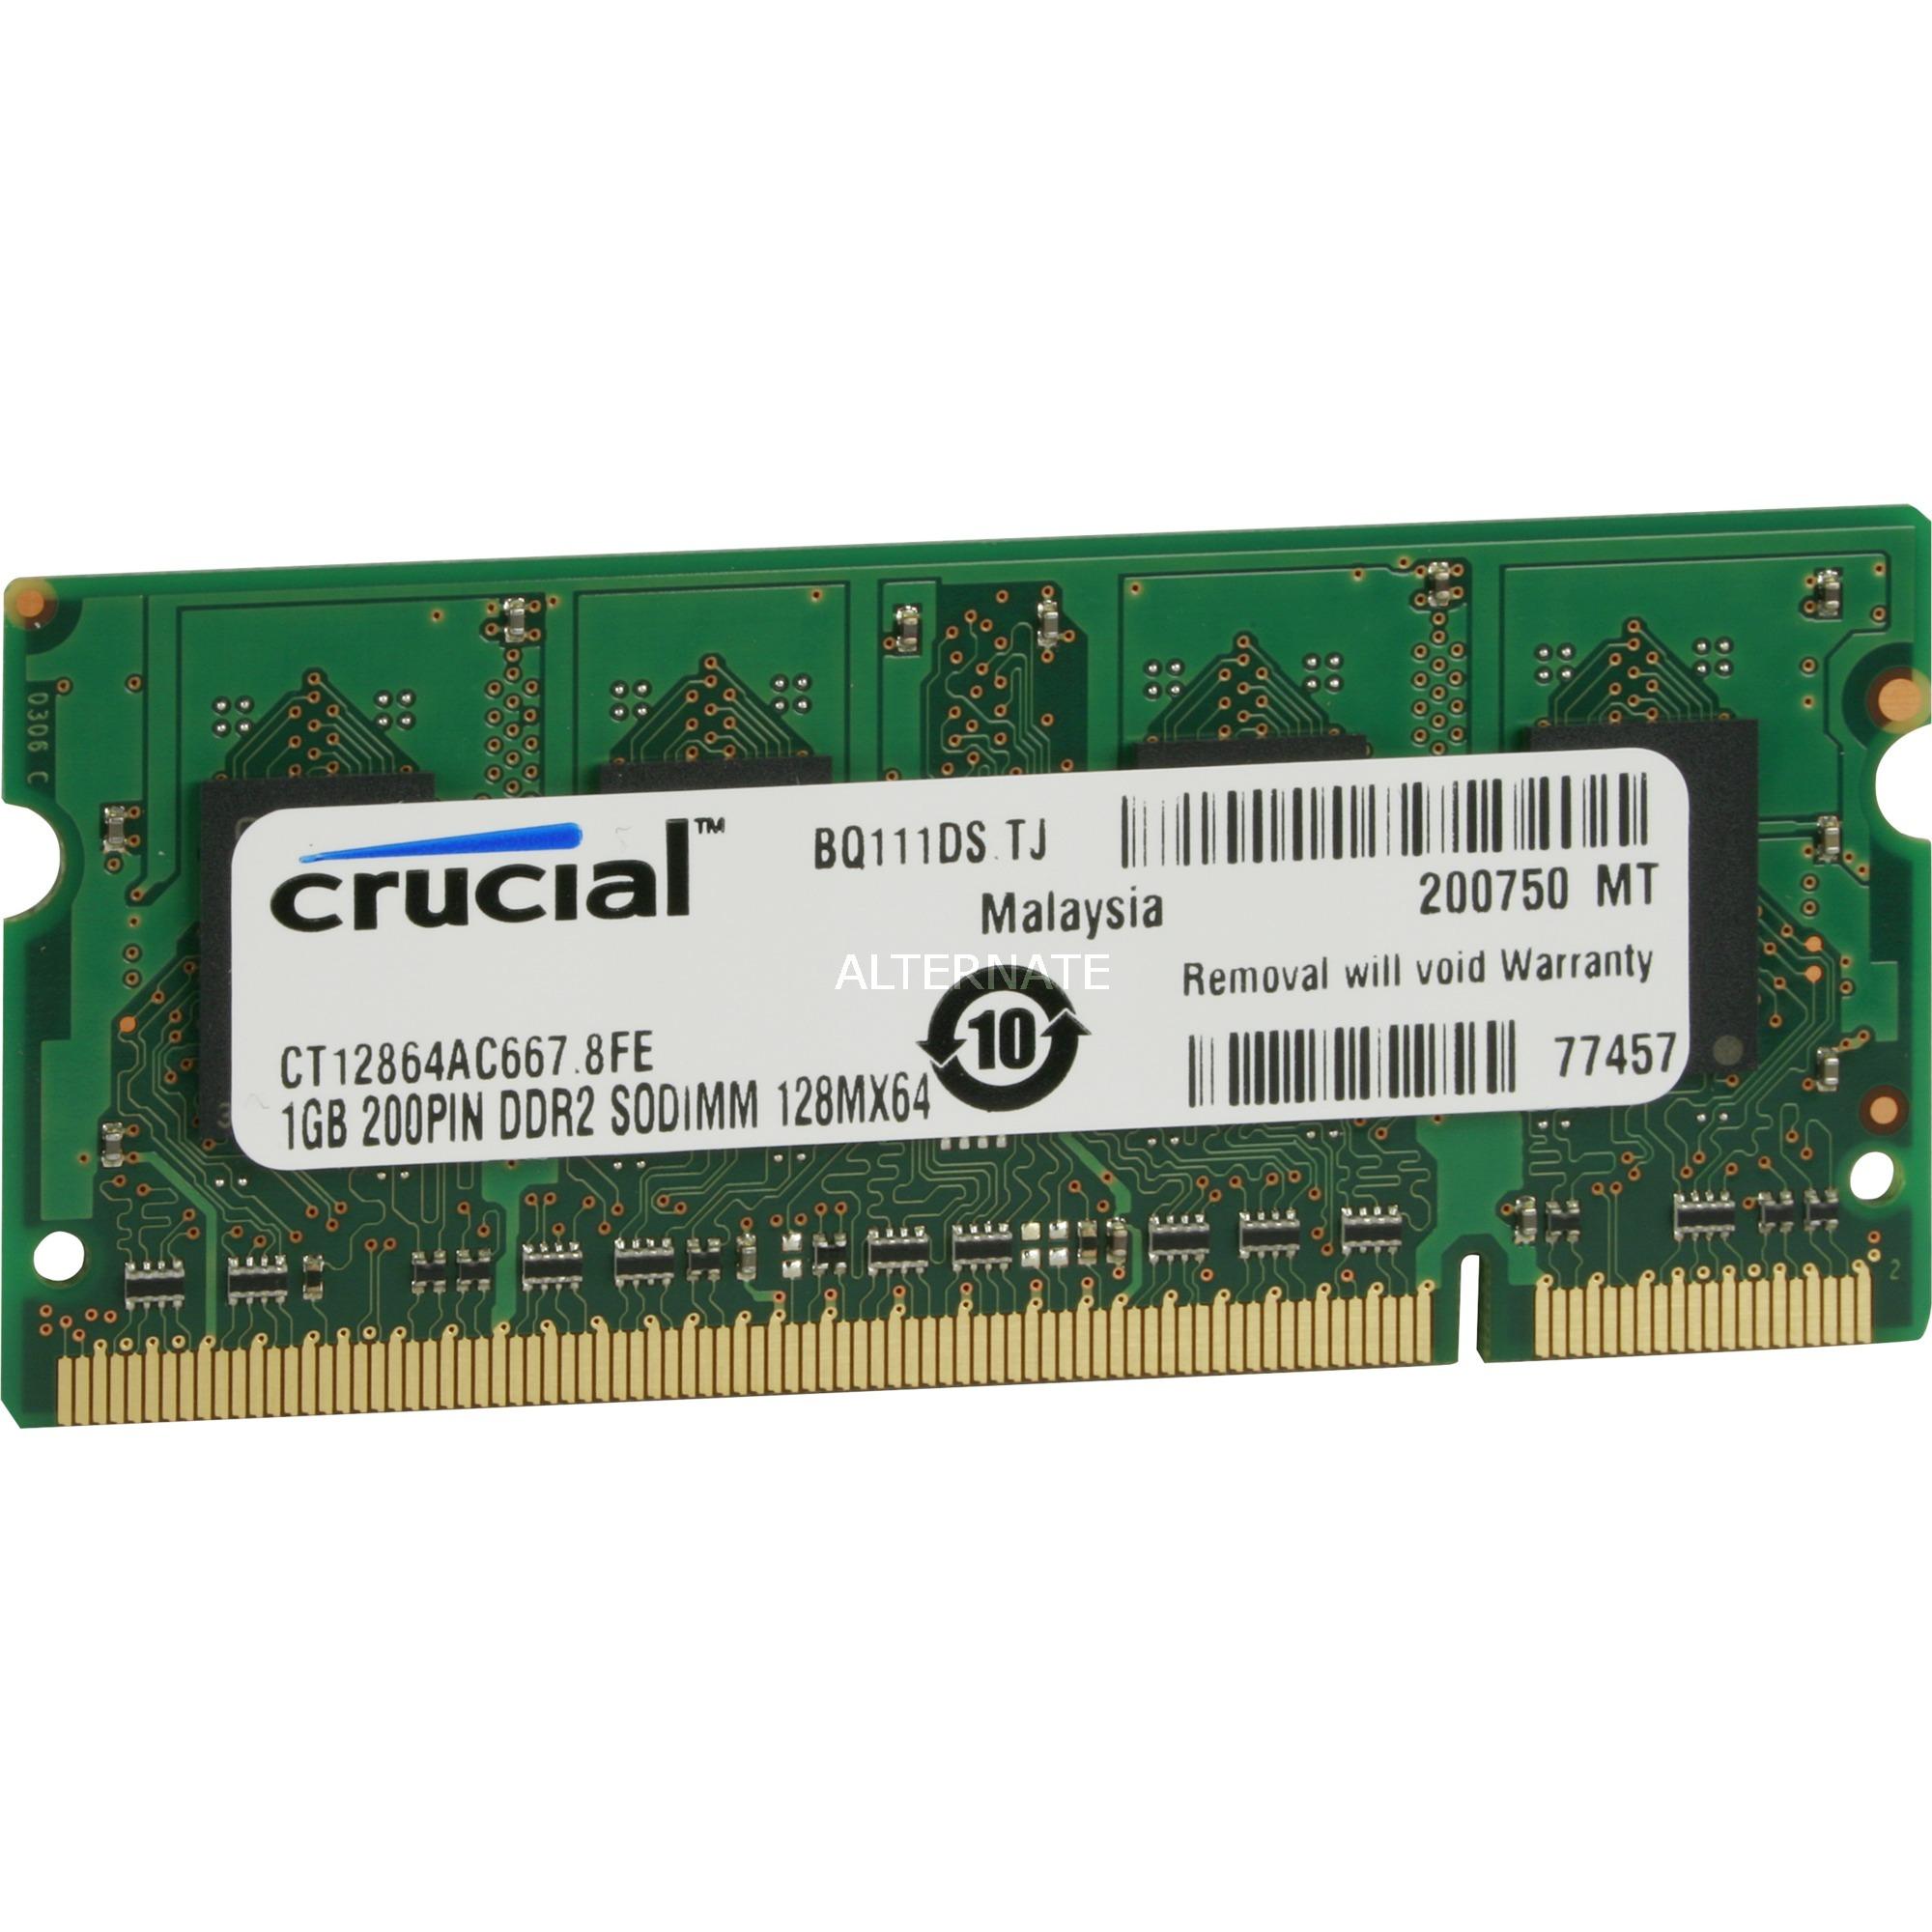 2GB DDR2 SODIMM módulo de memoria 667 MHz, Memoria RAM